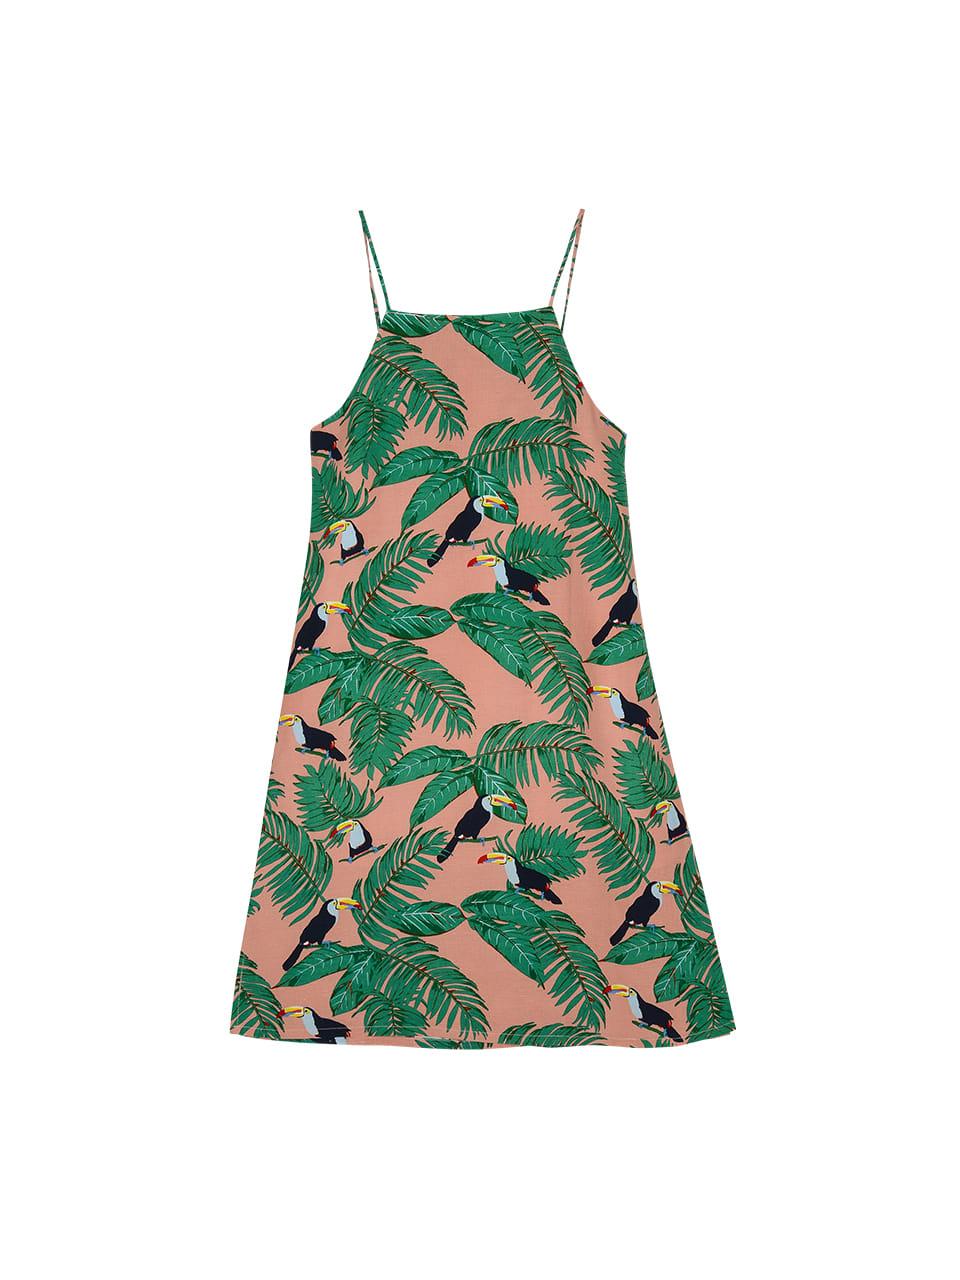 PARROT STRING KIDS DRESSswimwear,수영복,비키니,데이즈데이즈,dazedayz,디자이너수영복,스윔웨어